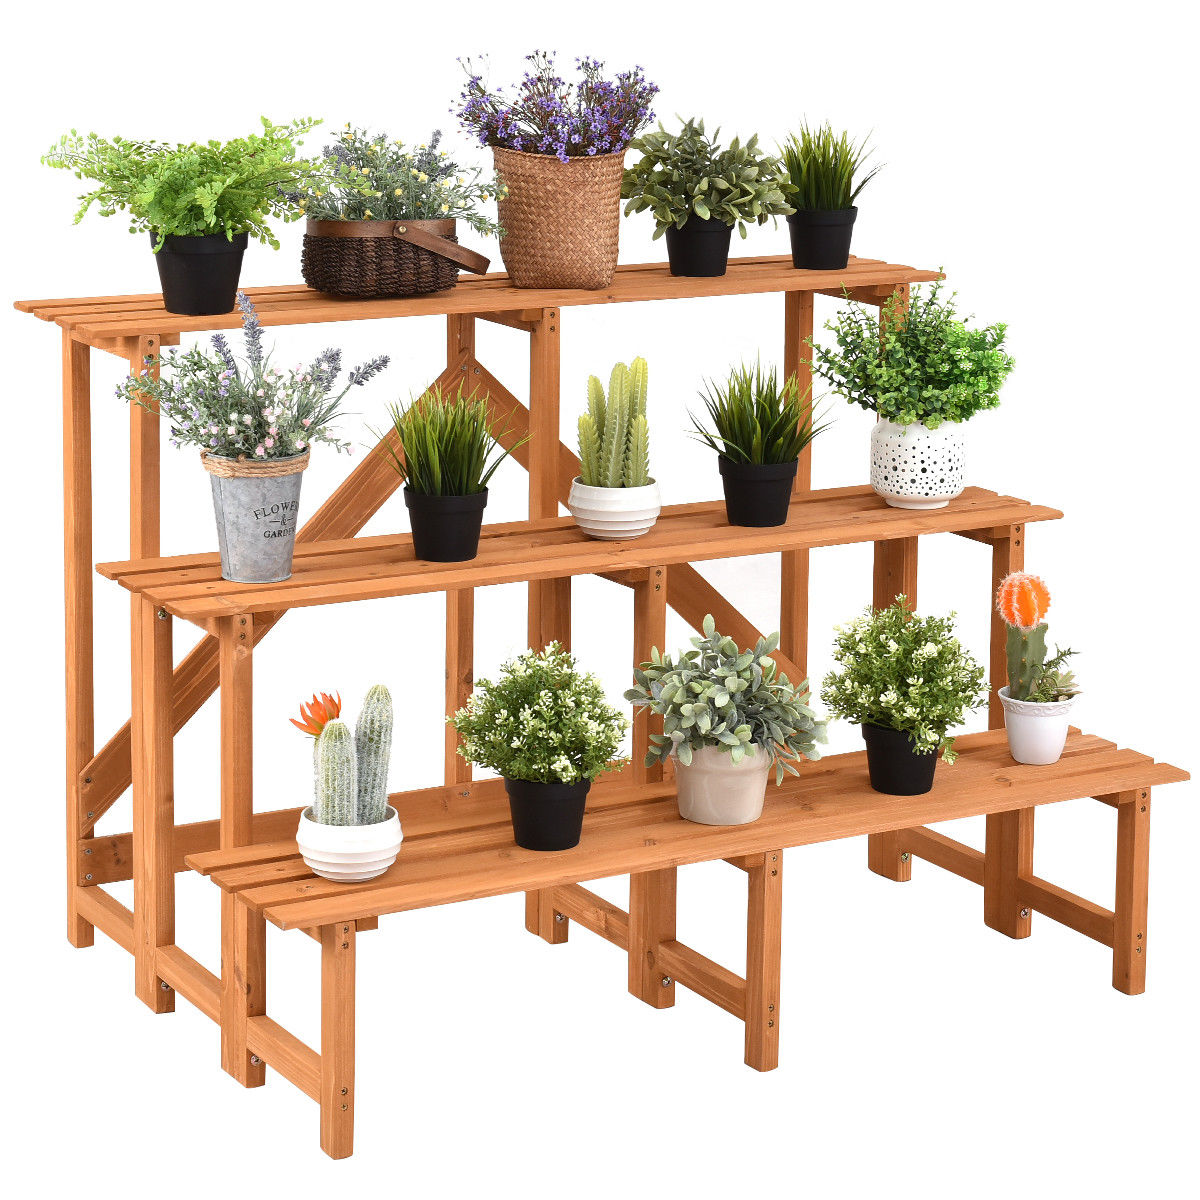 3-Tier Wide Wood Flower Pot Step Ladder Plant Stand